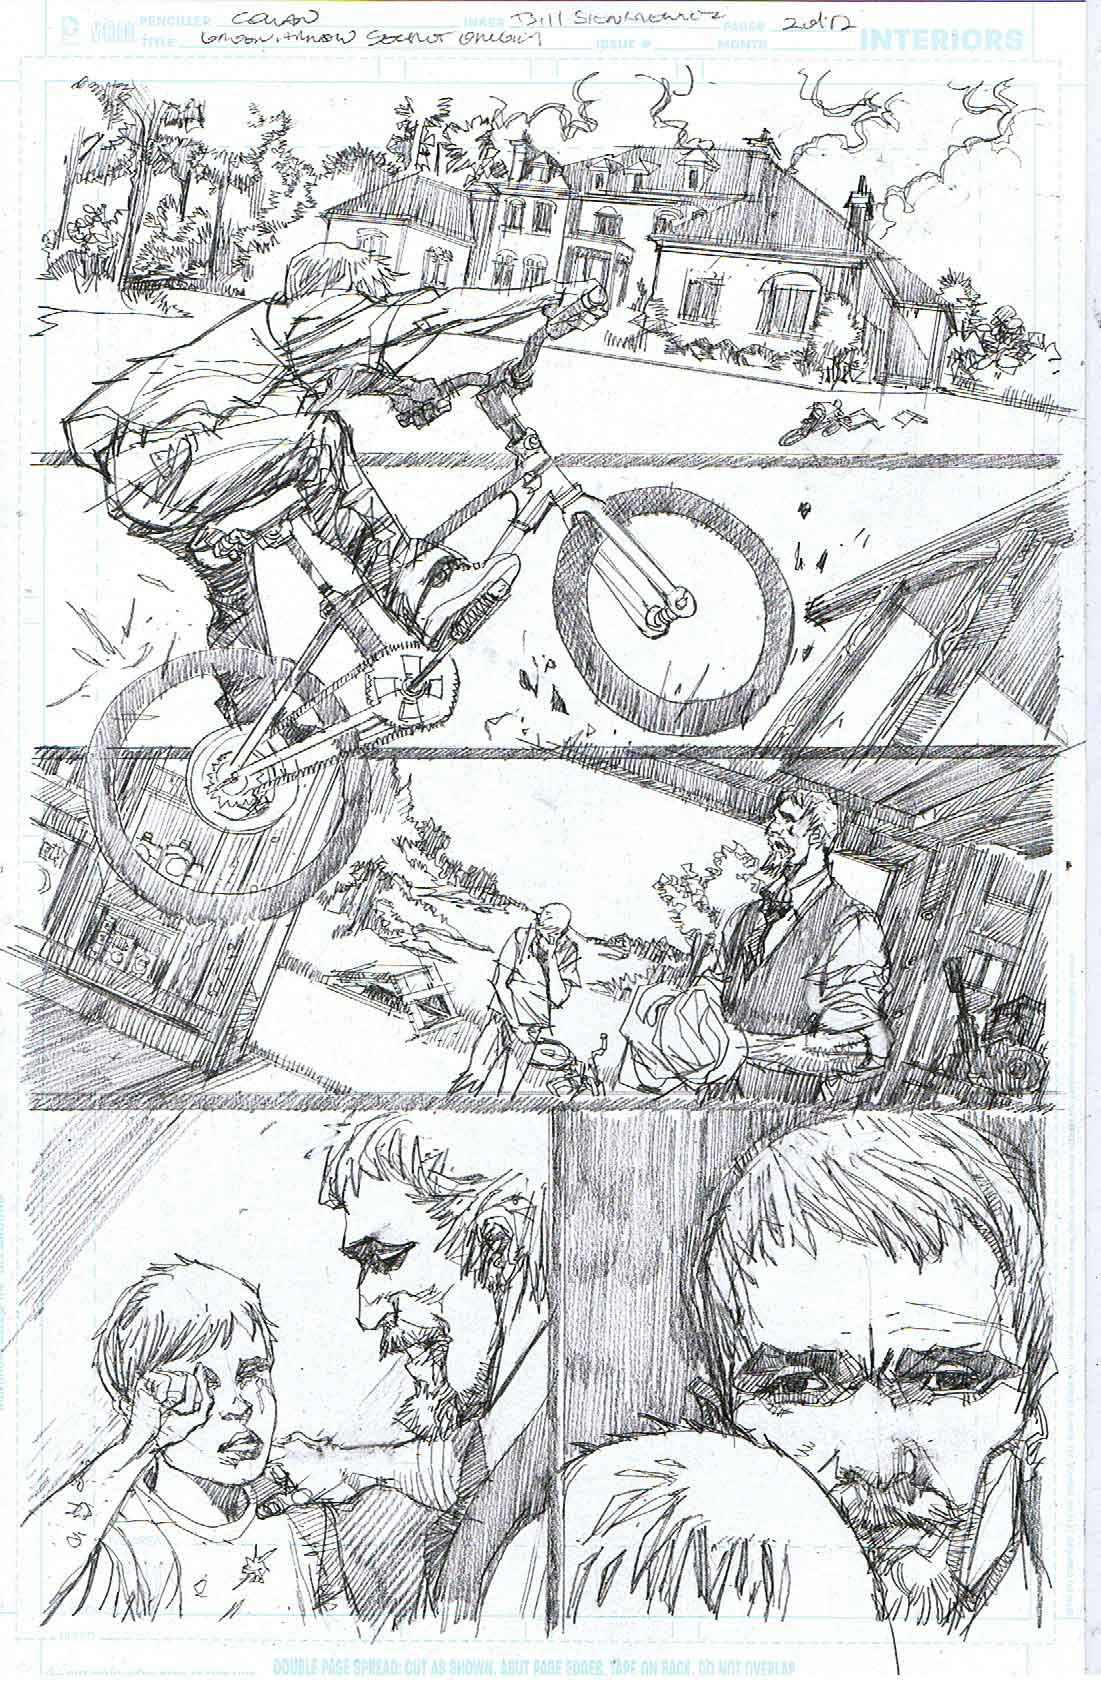 Green Arrow: Secret Origins - Page 2 - Pencils